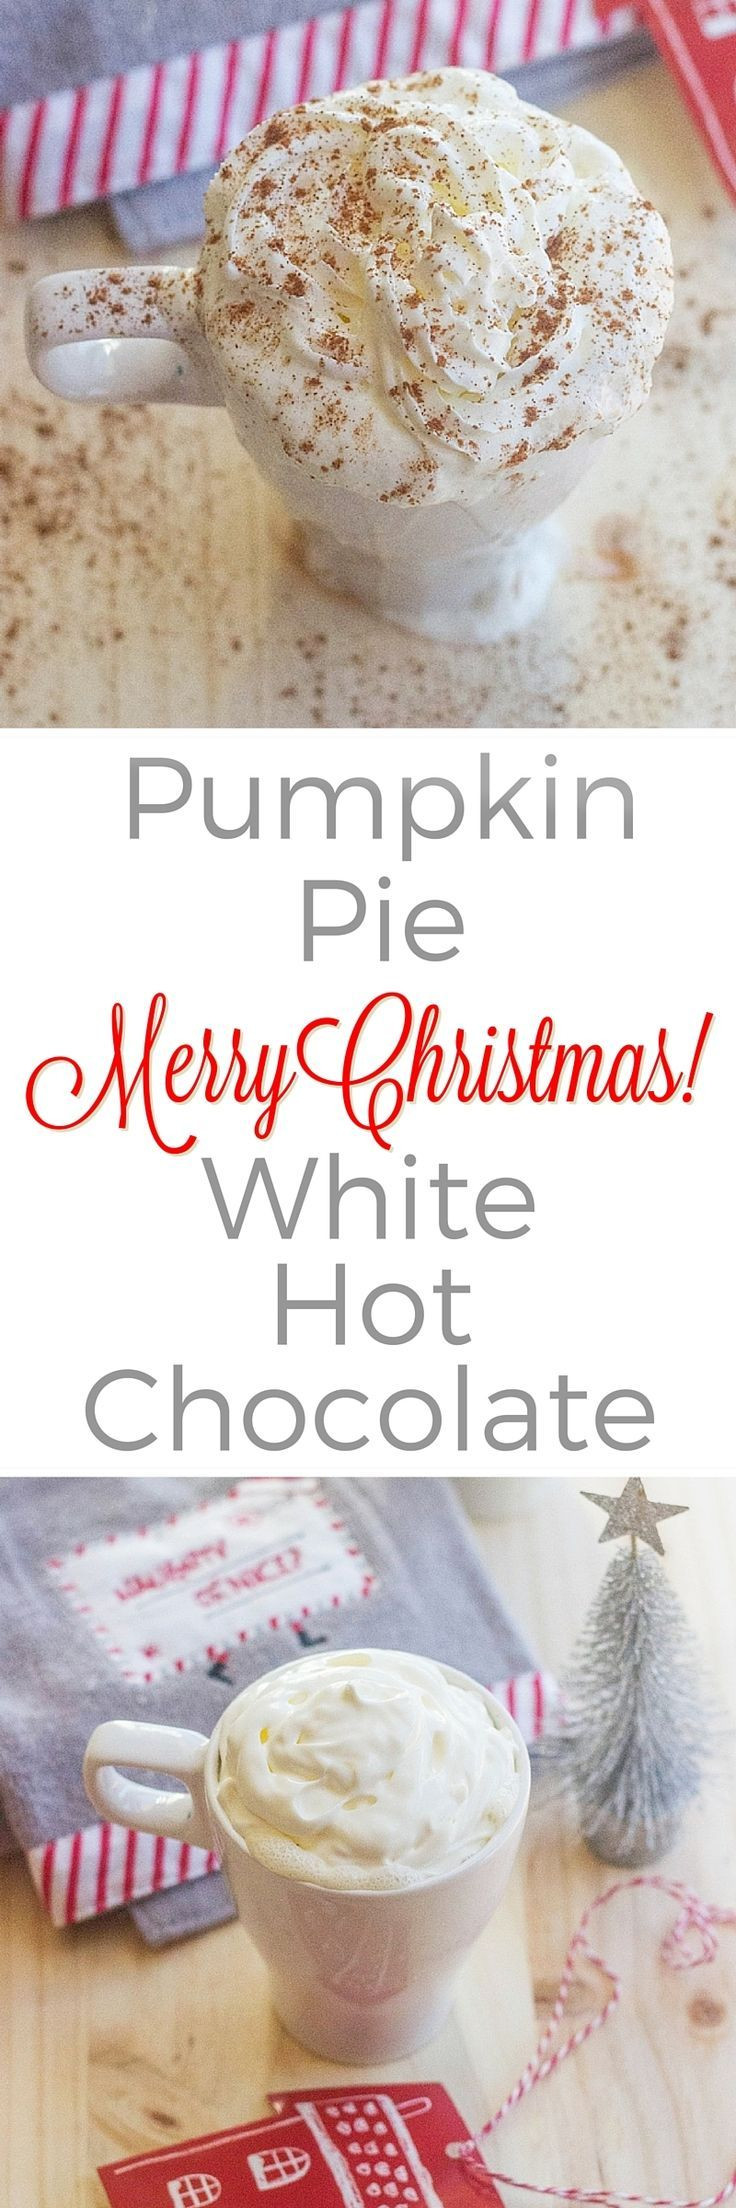 White Christmas Pie Recipes  Pumpkin Pie White Hot Chocolate Recipe